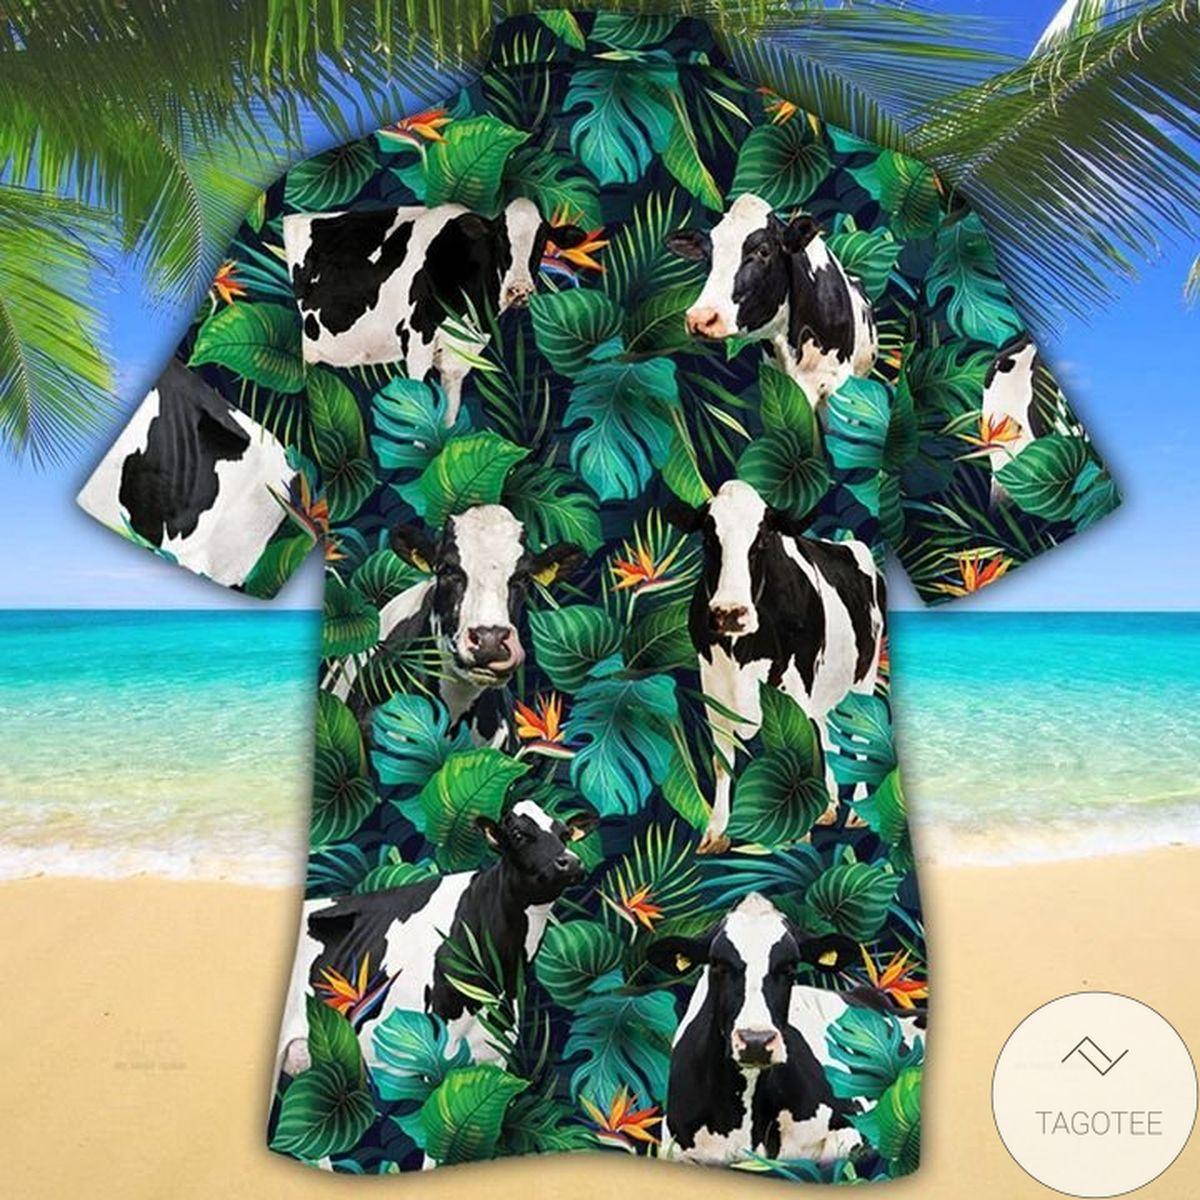 Very Good Quality Holstein Friesian Cattle Lovers Tropical Leaves Hawaiian Shirt